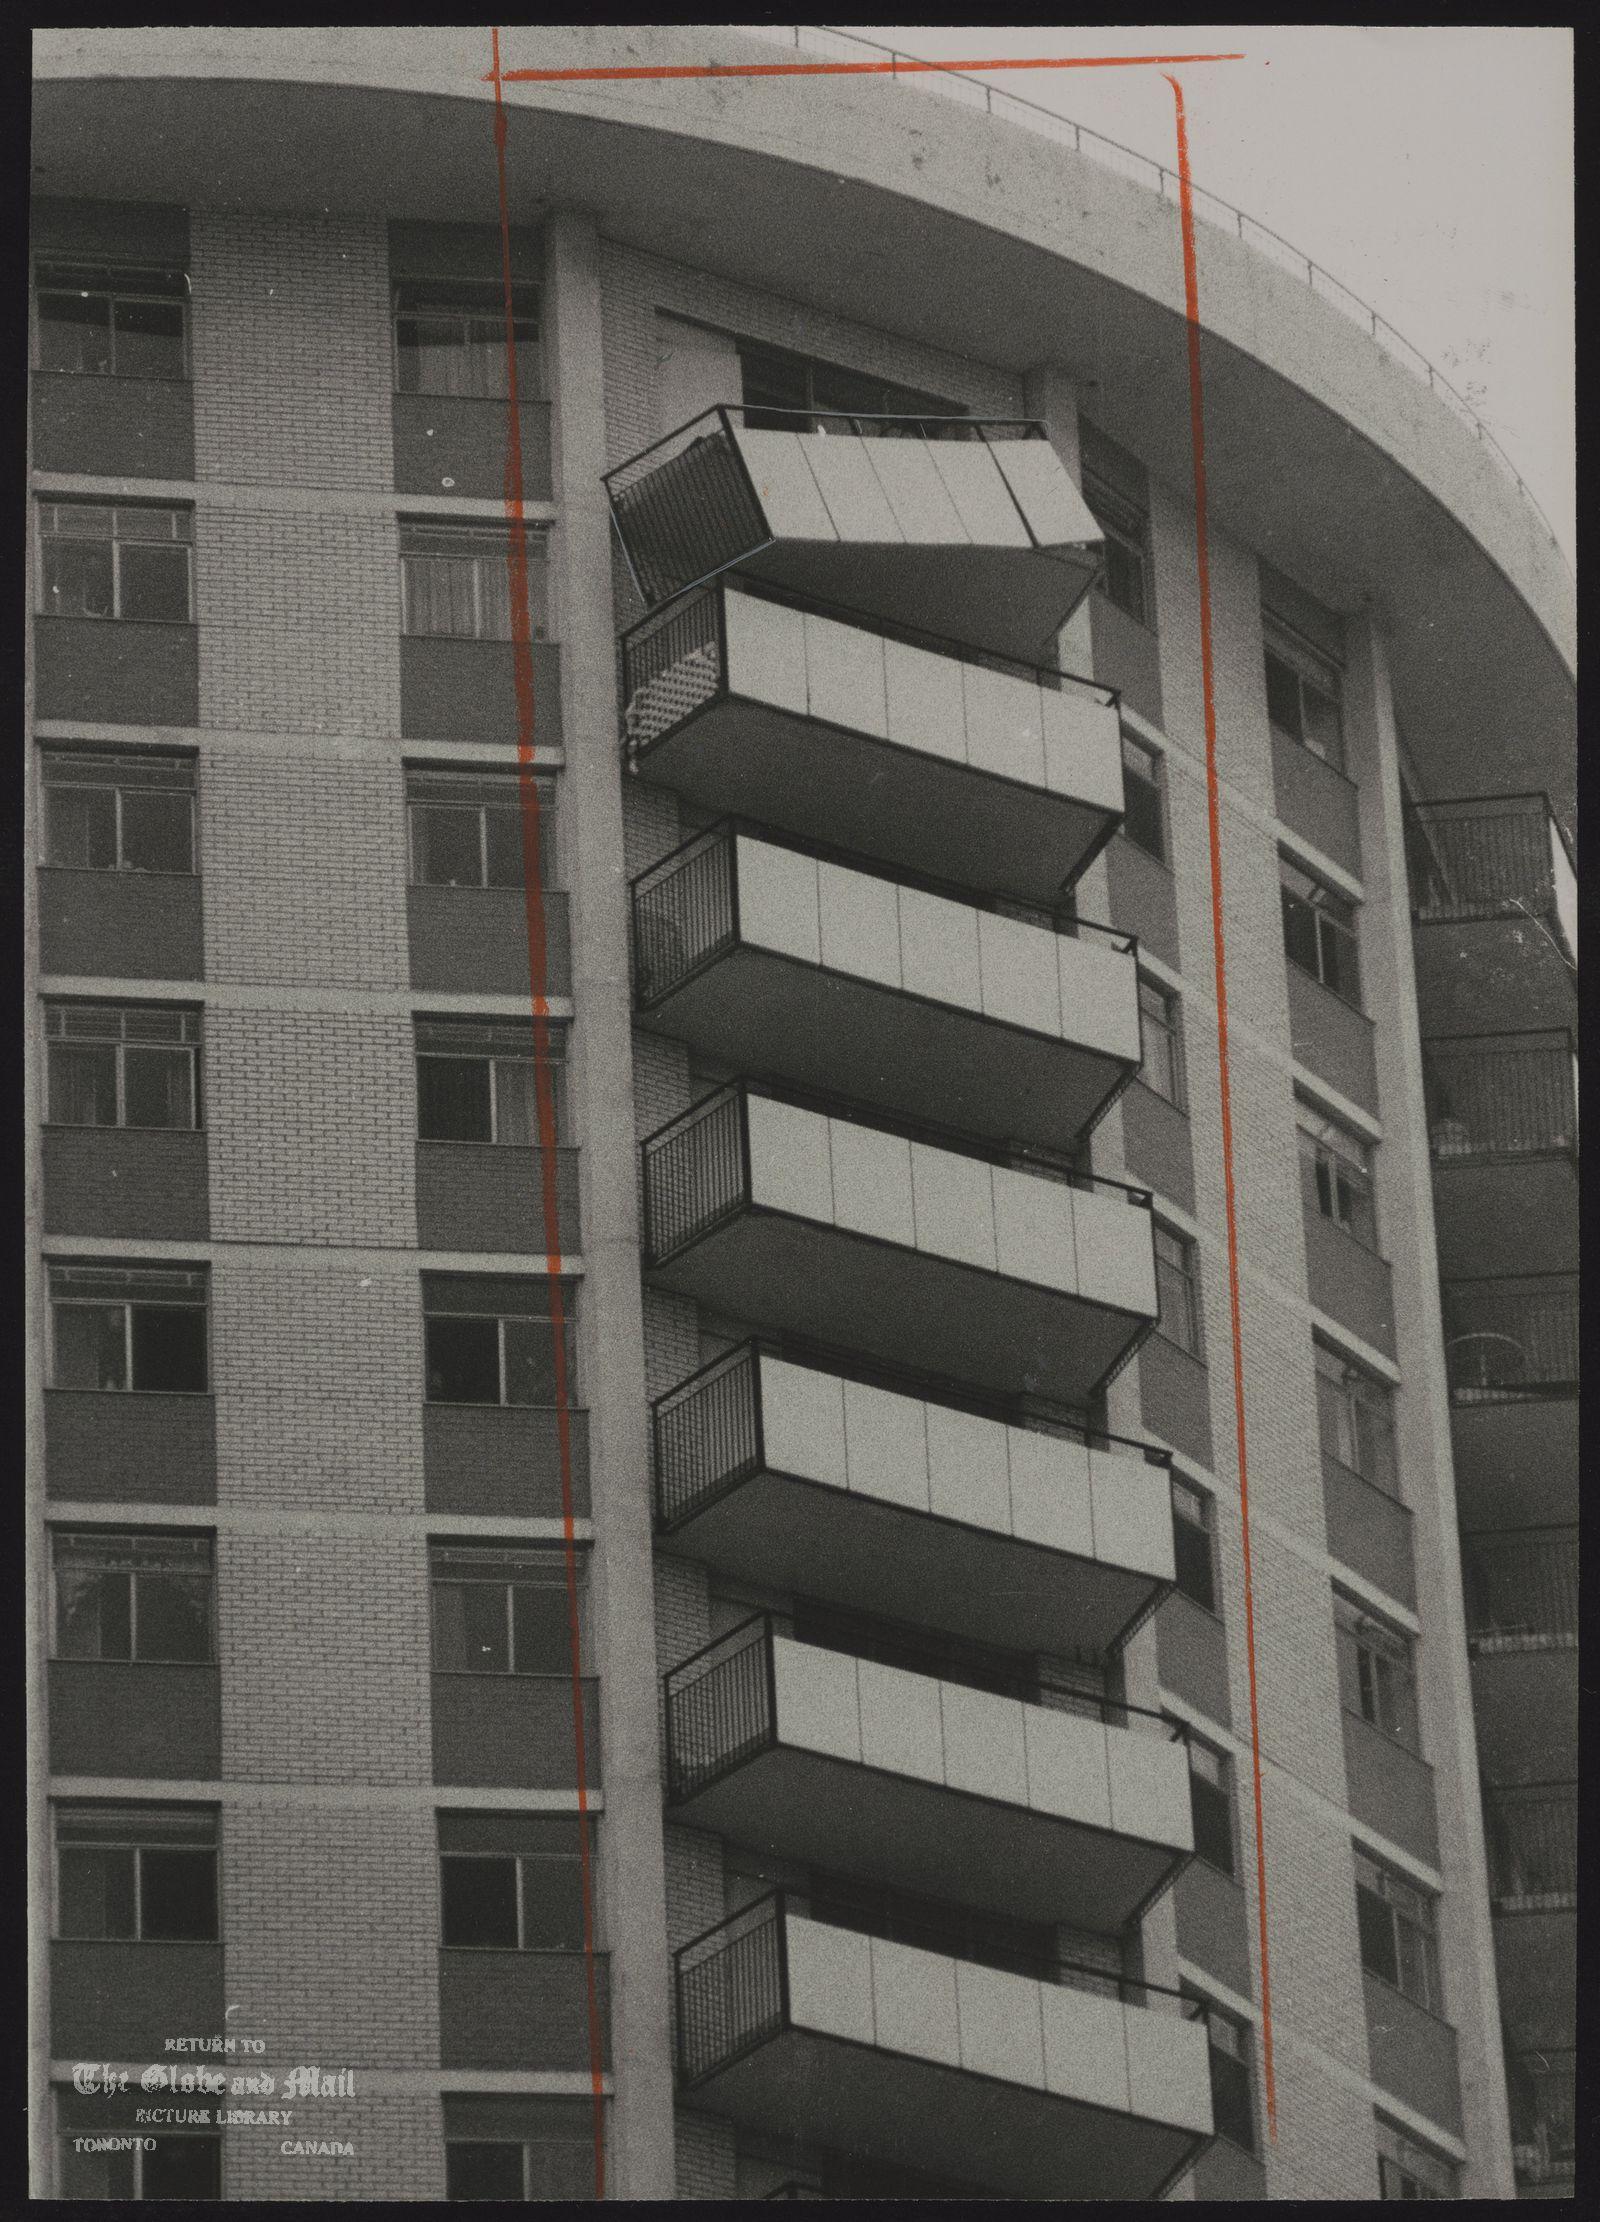 APARTMENT BUILDINGS [29th floor of 50 Alexander St near Maple Leaf Gardens]